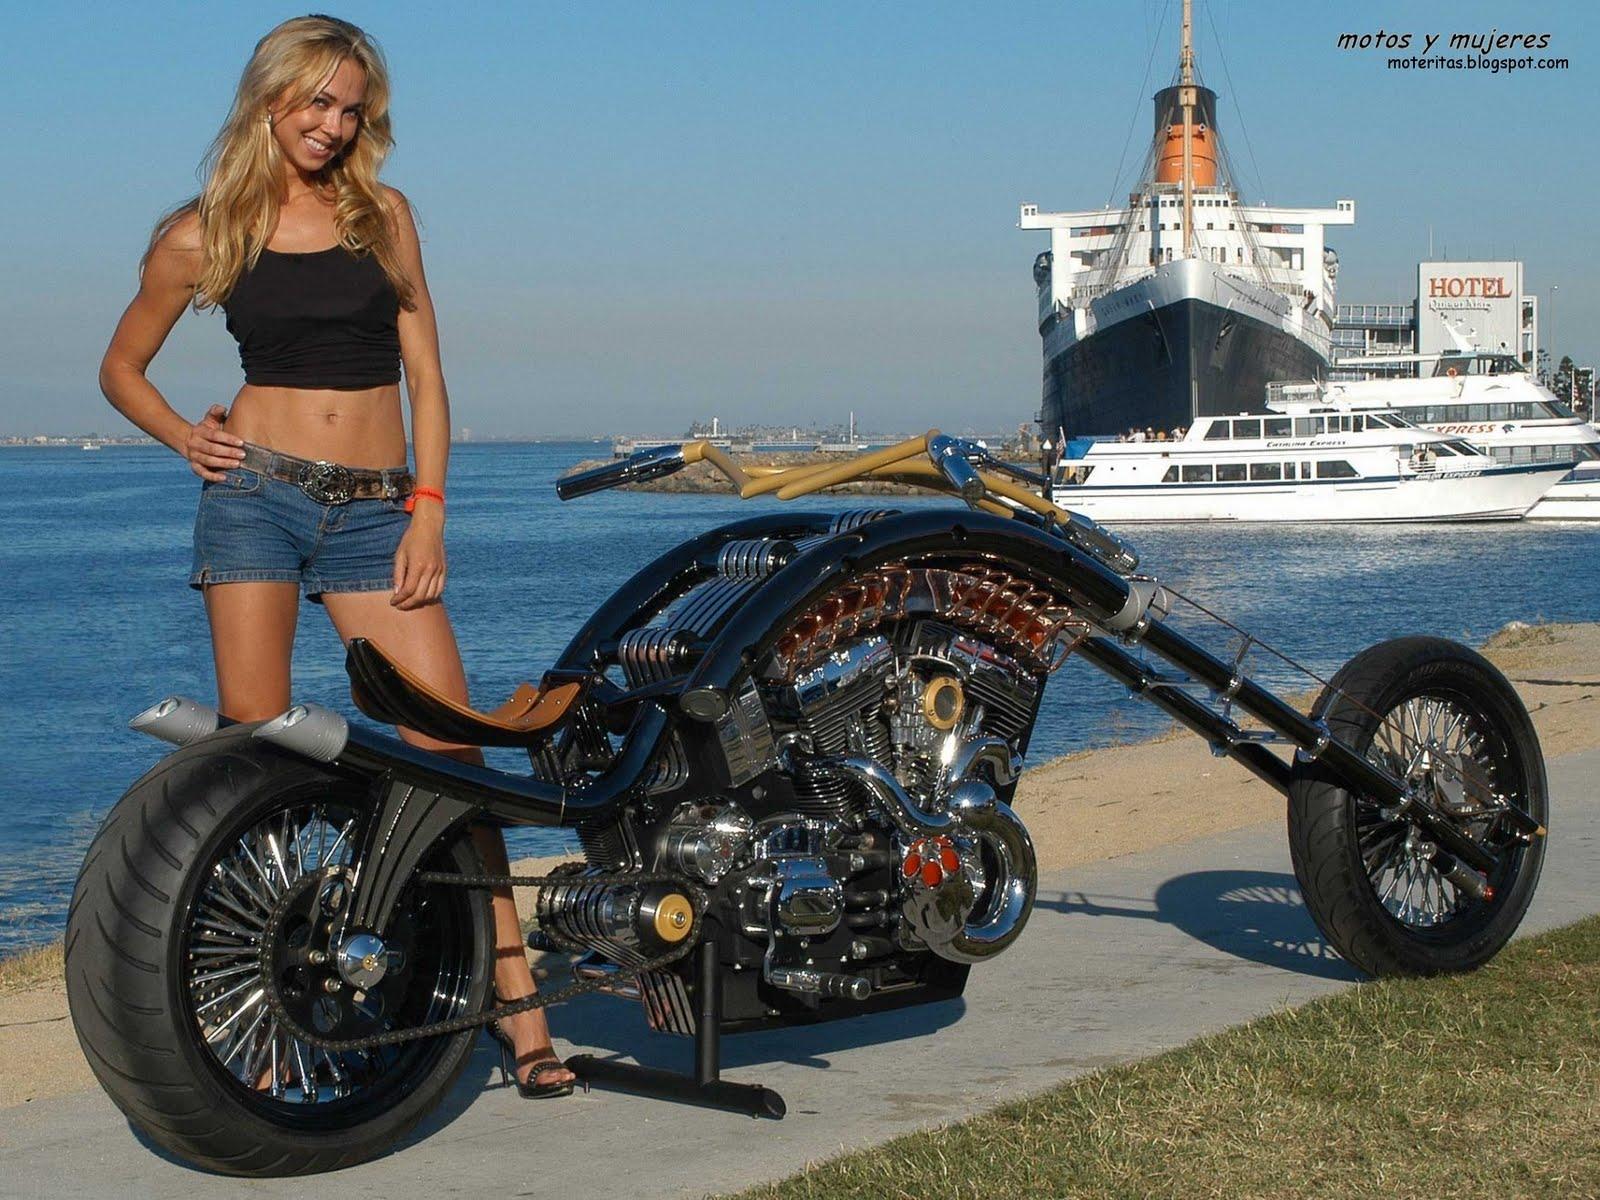 http://1.bp.blogspot.com/-E1LGax0tnM4/TrFLMfuQhLI/AAAAAAAAAec/HxuX4z5PzmA/s1600/rubia-motos-chicas-chopper-custom-wallpaper+549+%5Bmoteritas.blogspot.com%5D.jpg